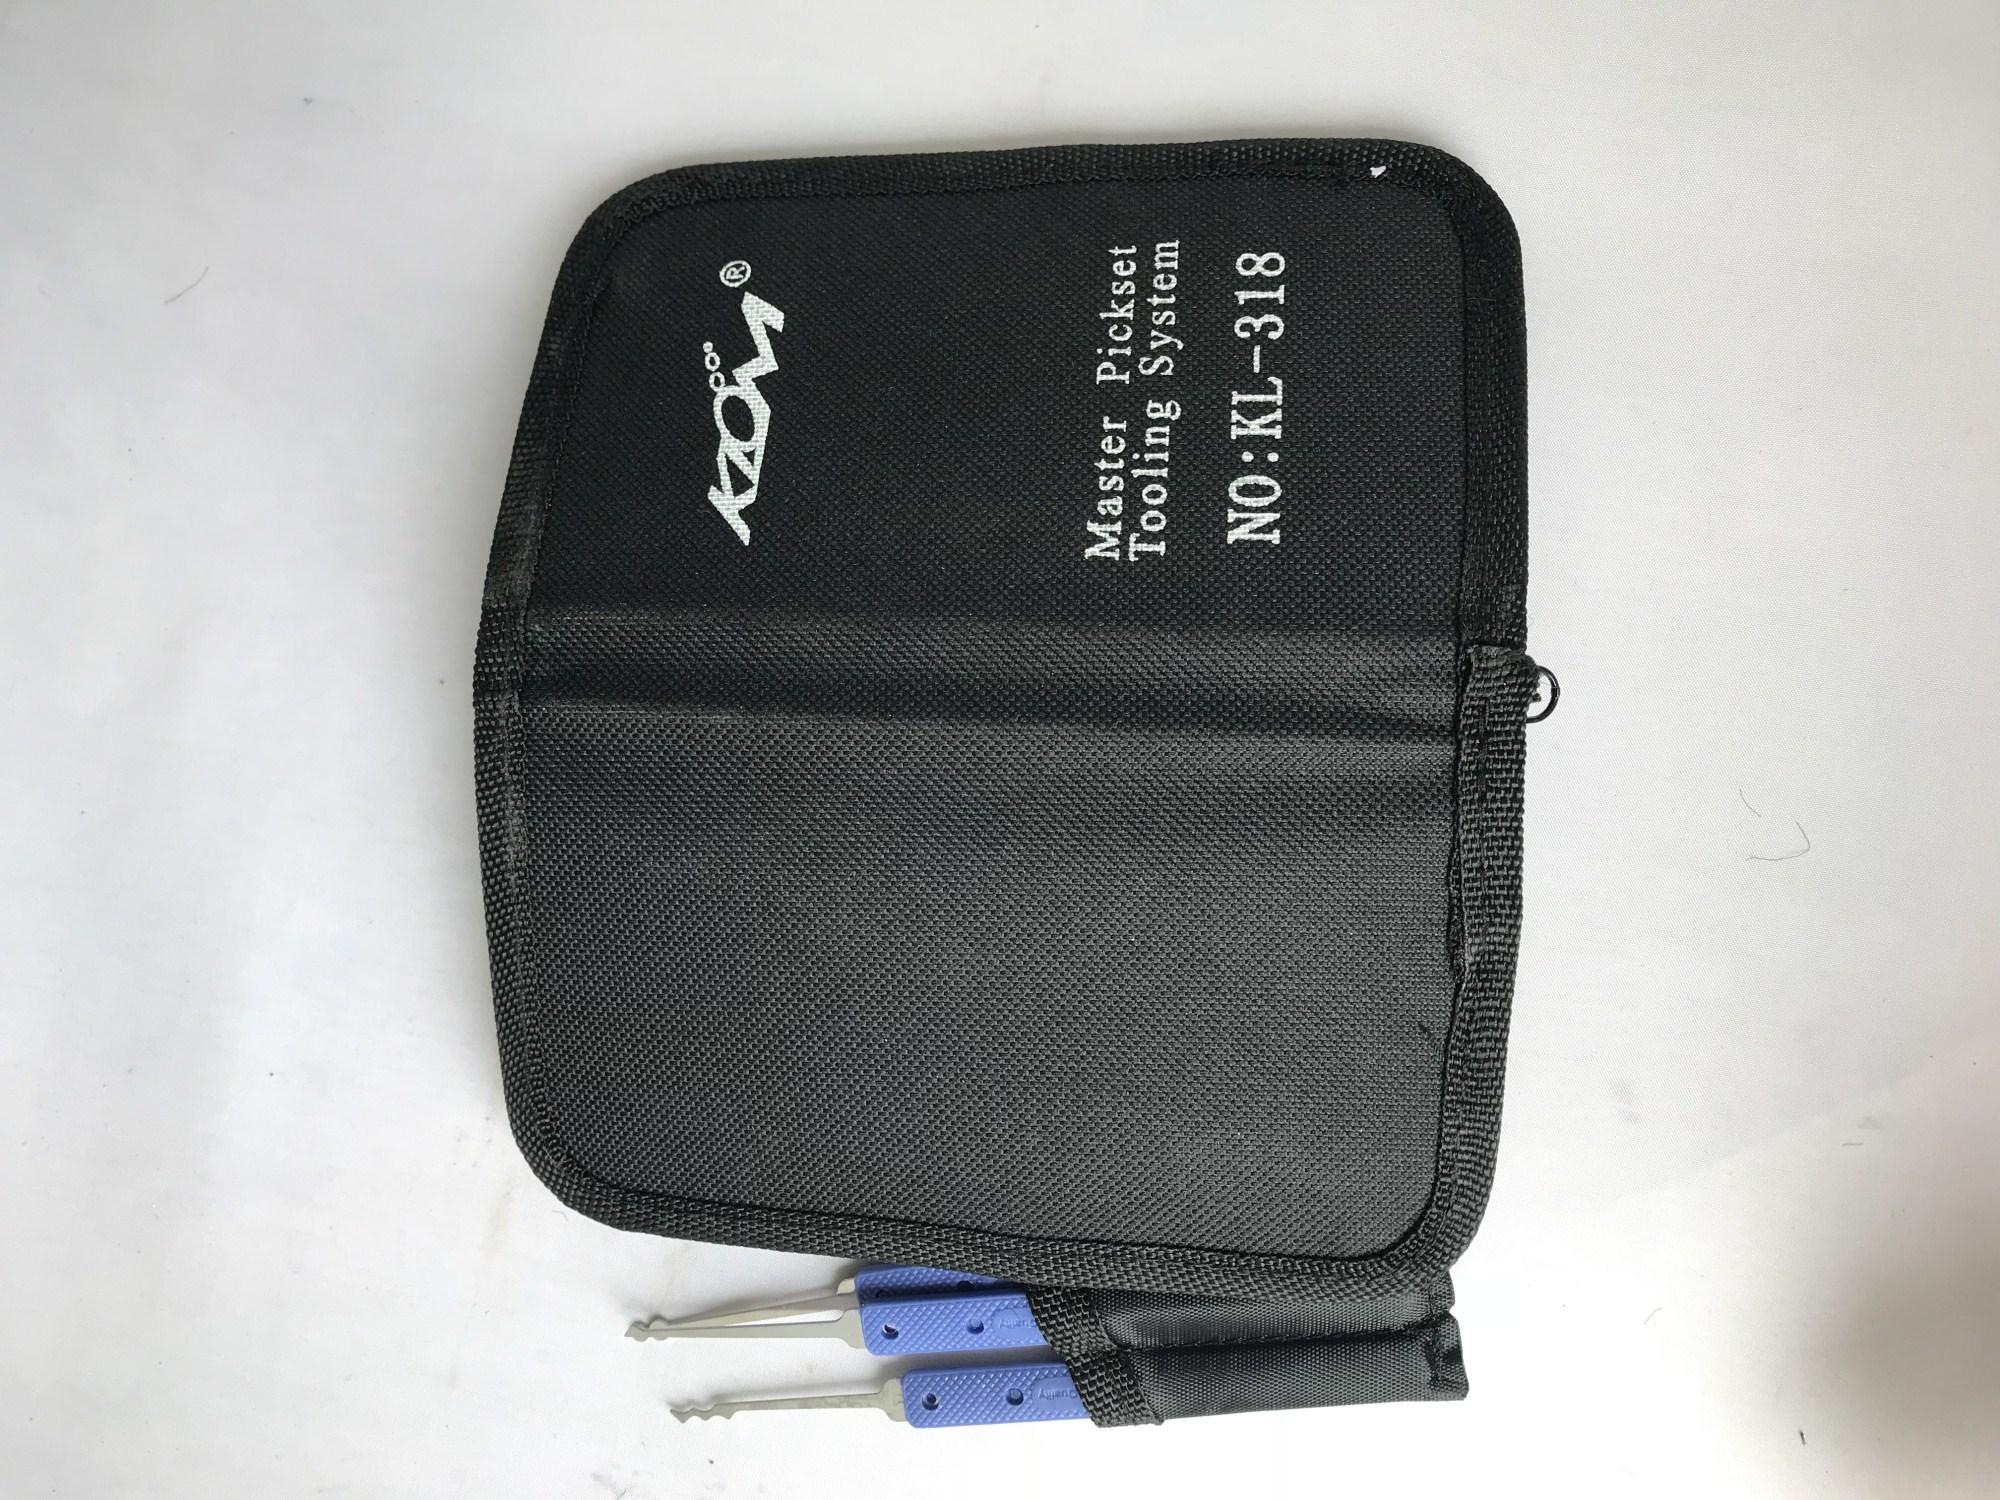 1-190 GOSO LOCKSMITH TOOLS 18PCS KEY TOOL door lock opener locksmith supplies KLOM pick set